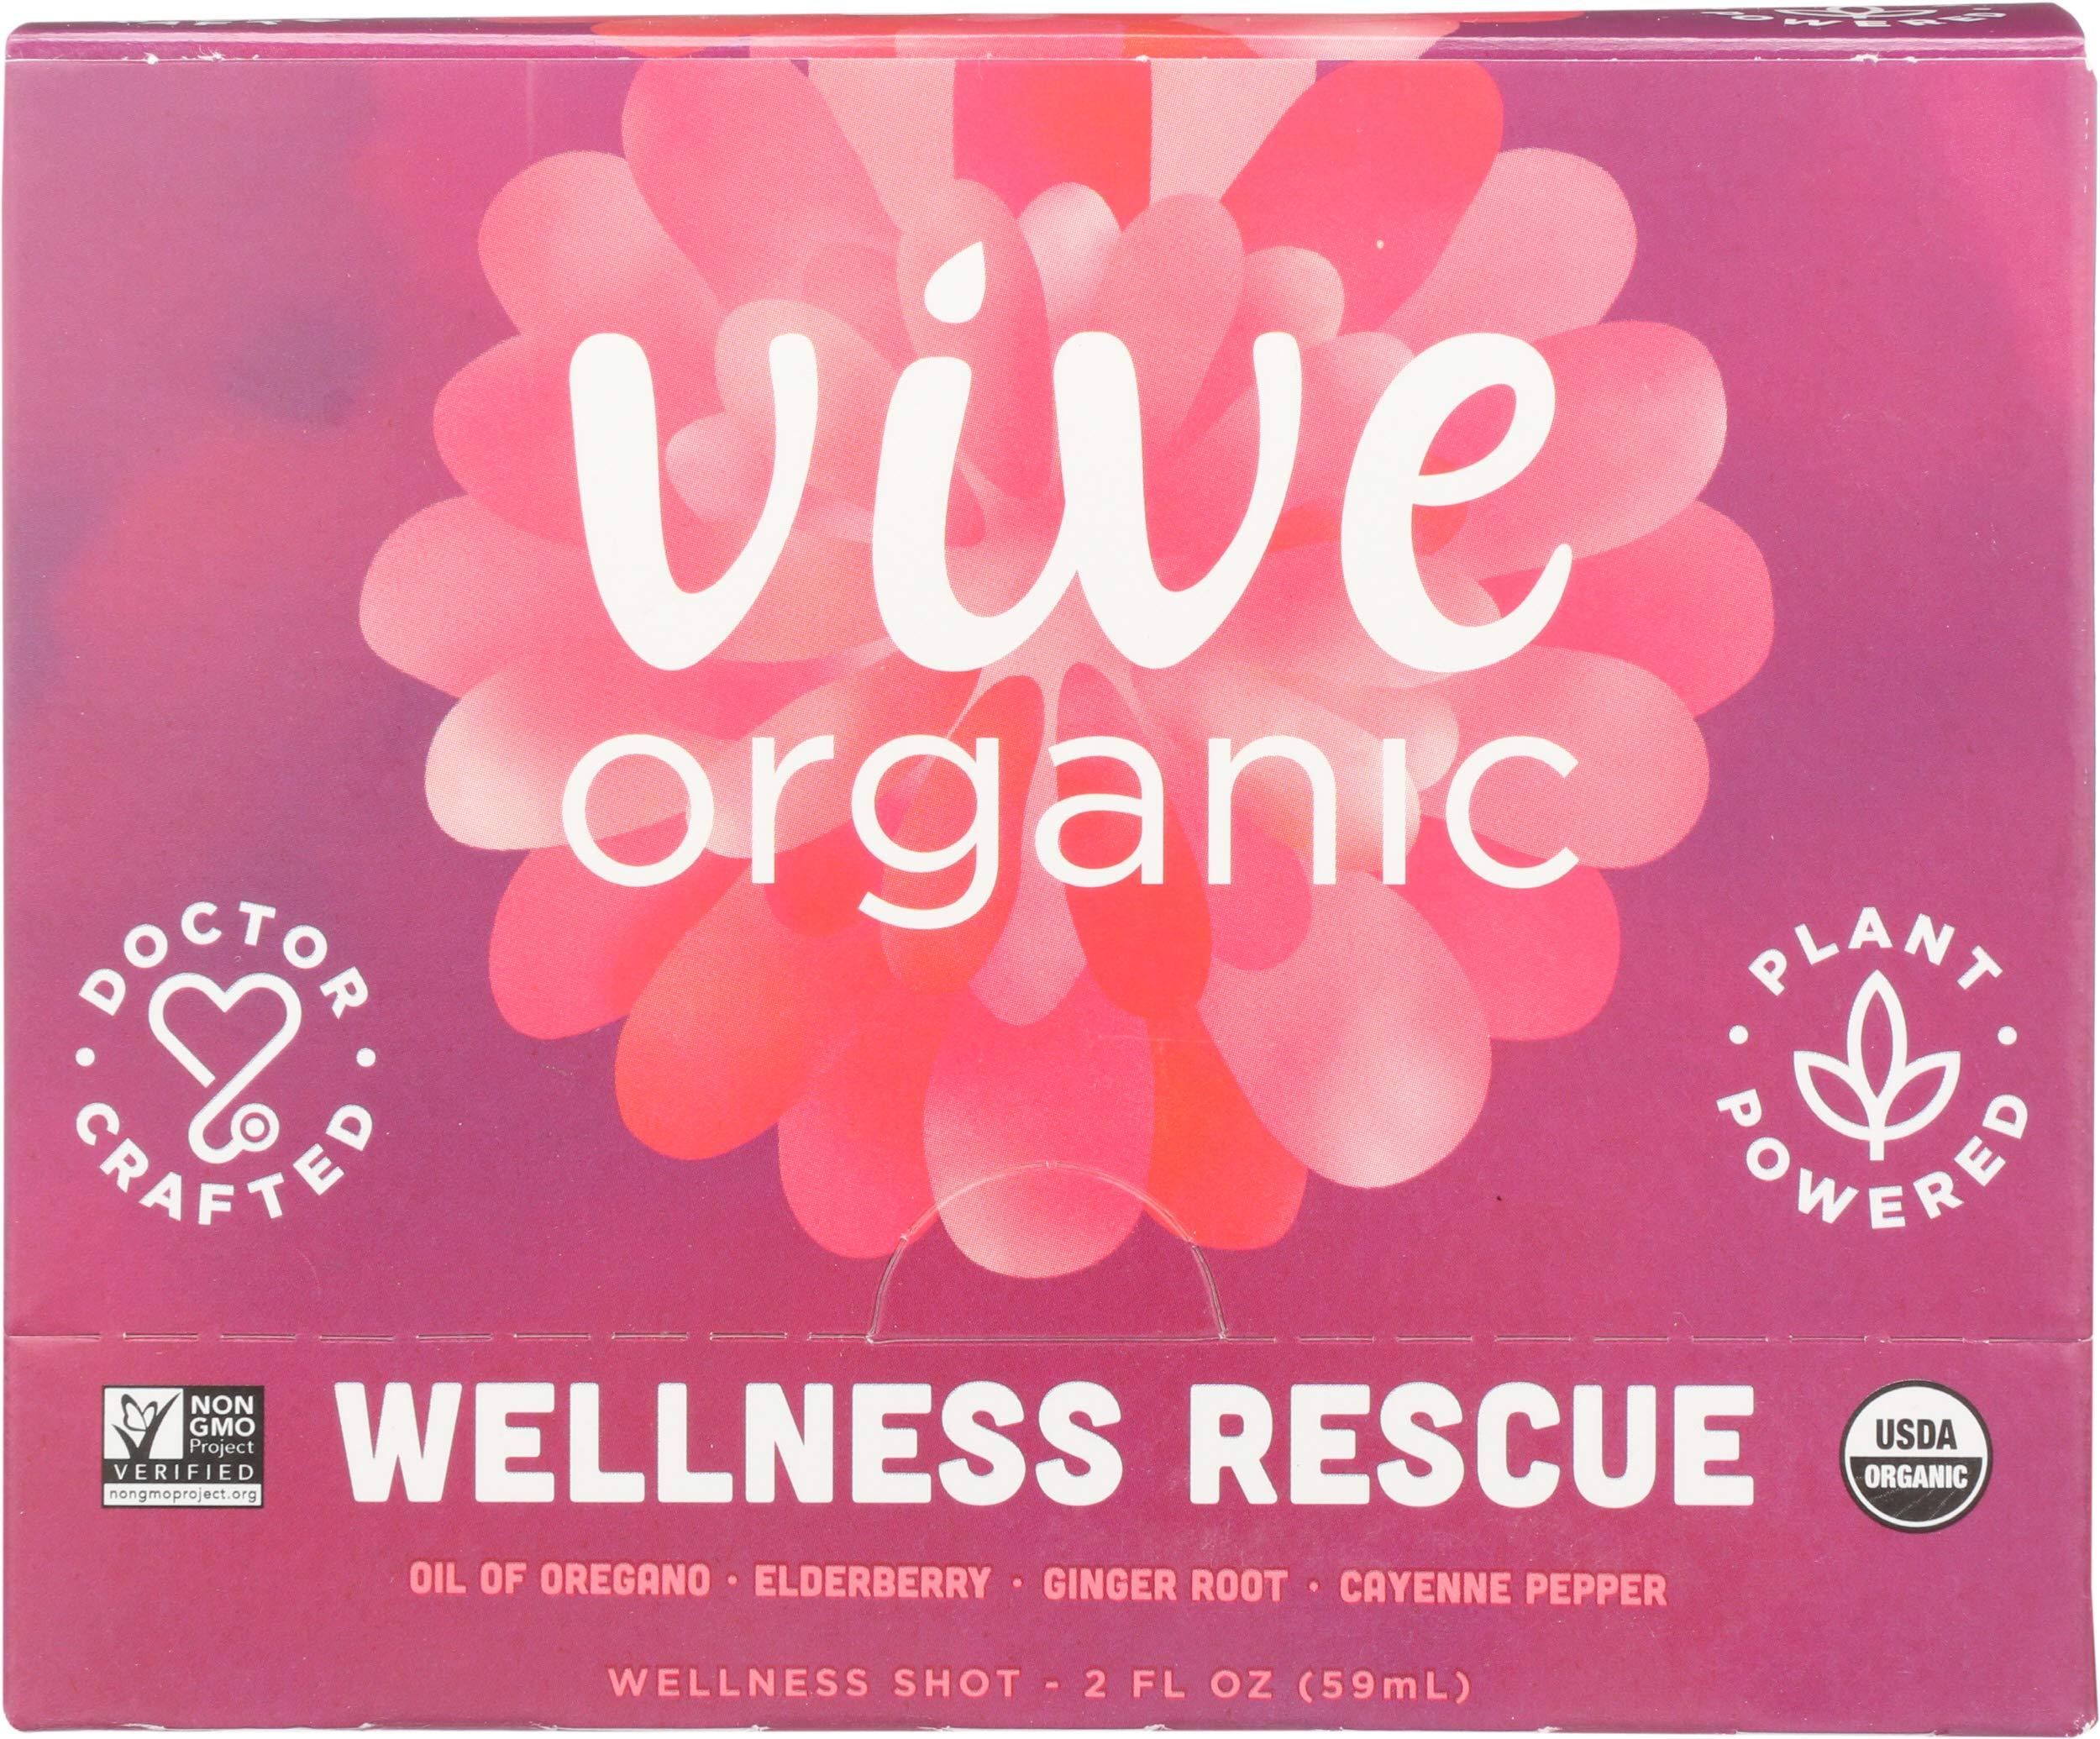 Vive Organic, Shot Wellness Rescue Case, 12 Count